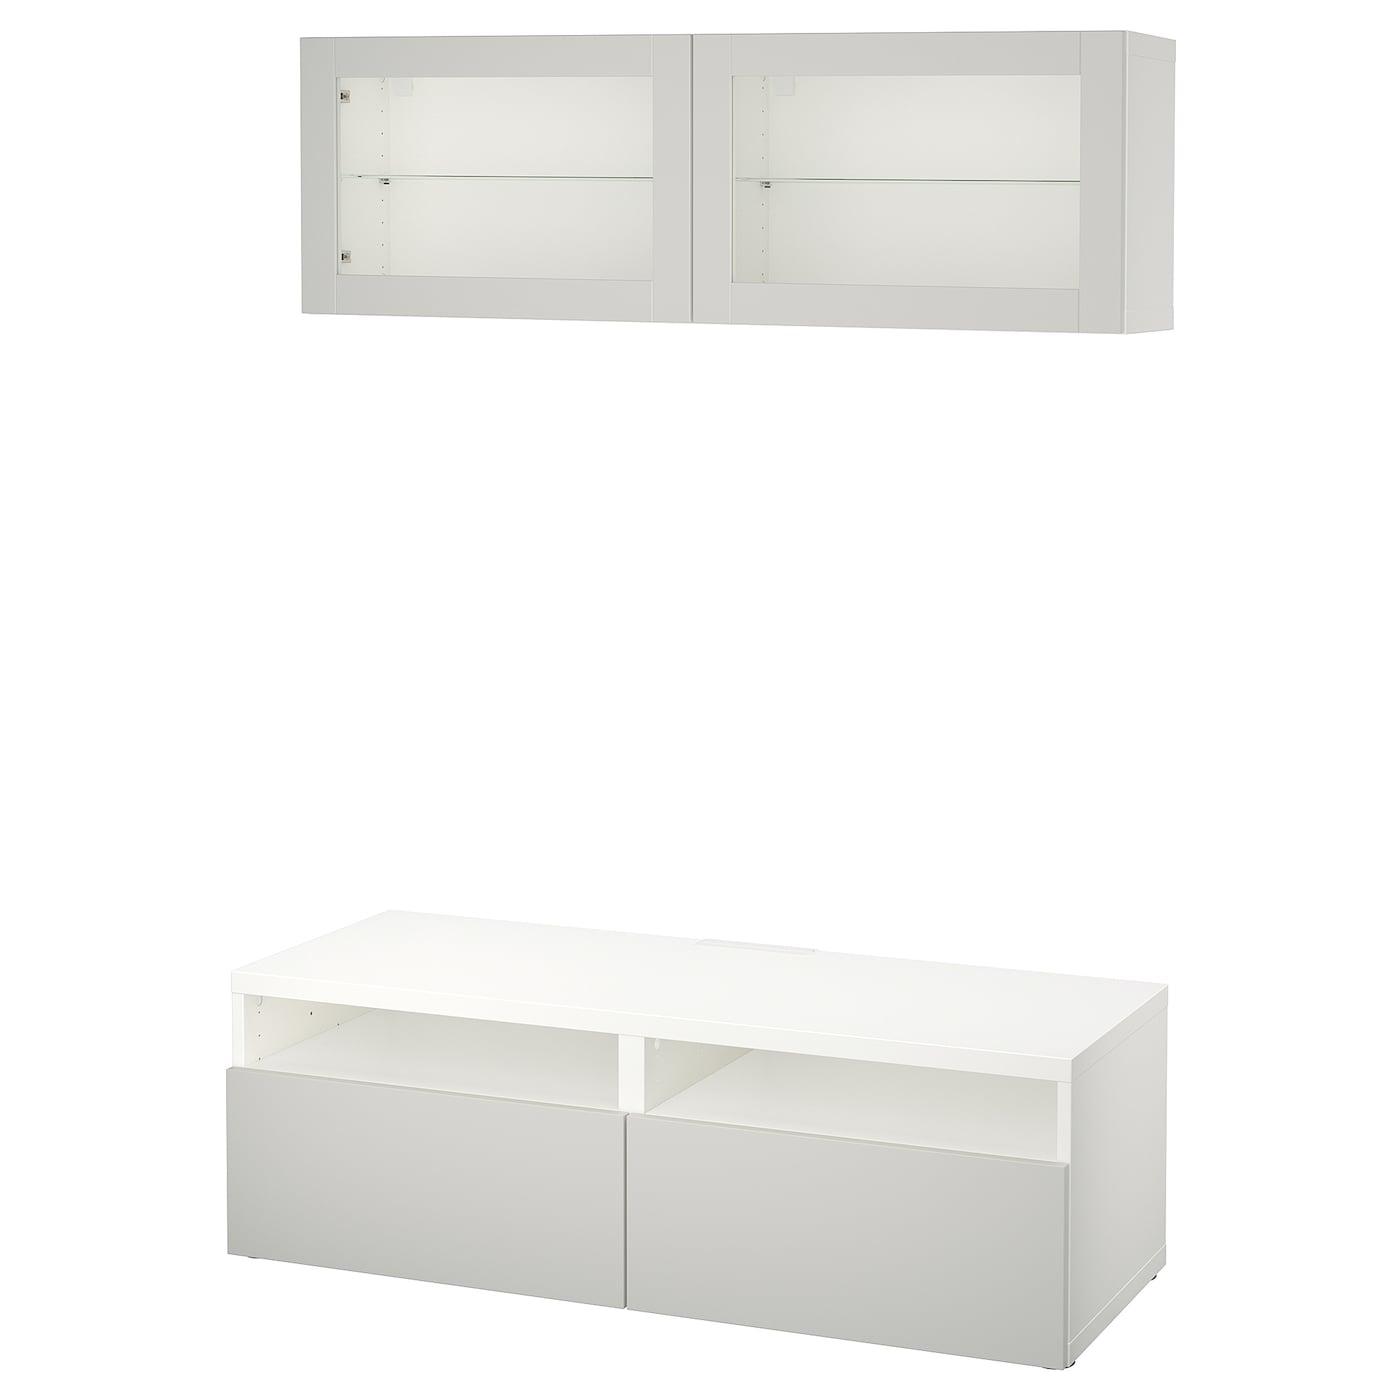 Best mueble tv con almacenaje blanco lappviken gris claro vidrio incoloro 120 x 20 40 x 166 cm - Muebles almacenaje ikea ...